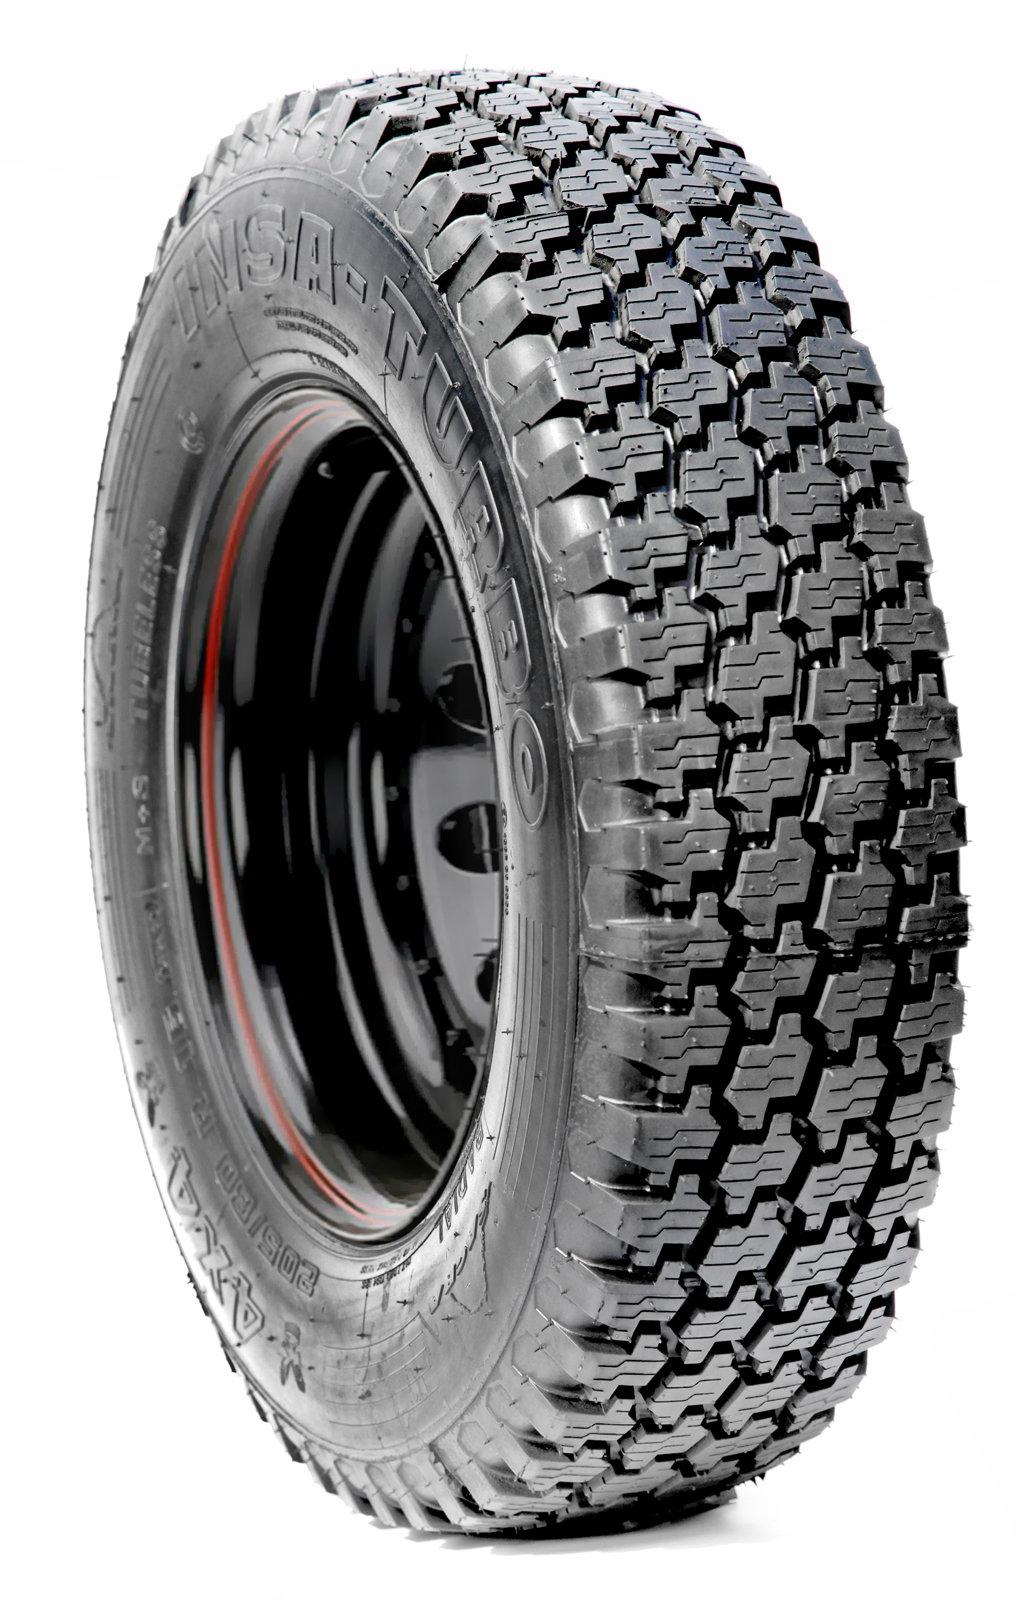 insa-turbo-sagra-235-75r15105s